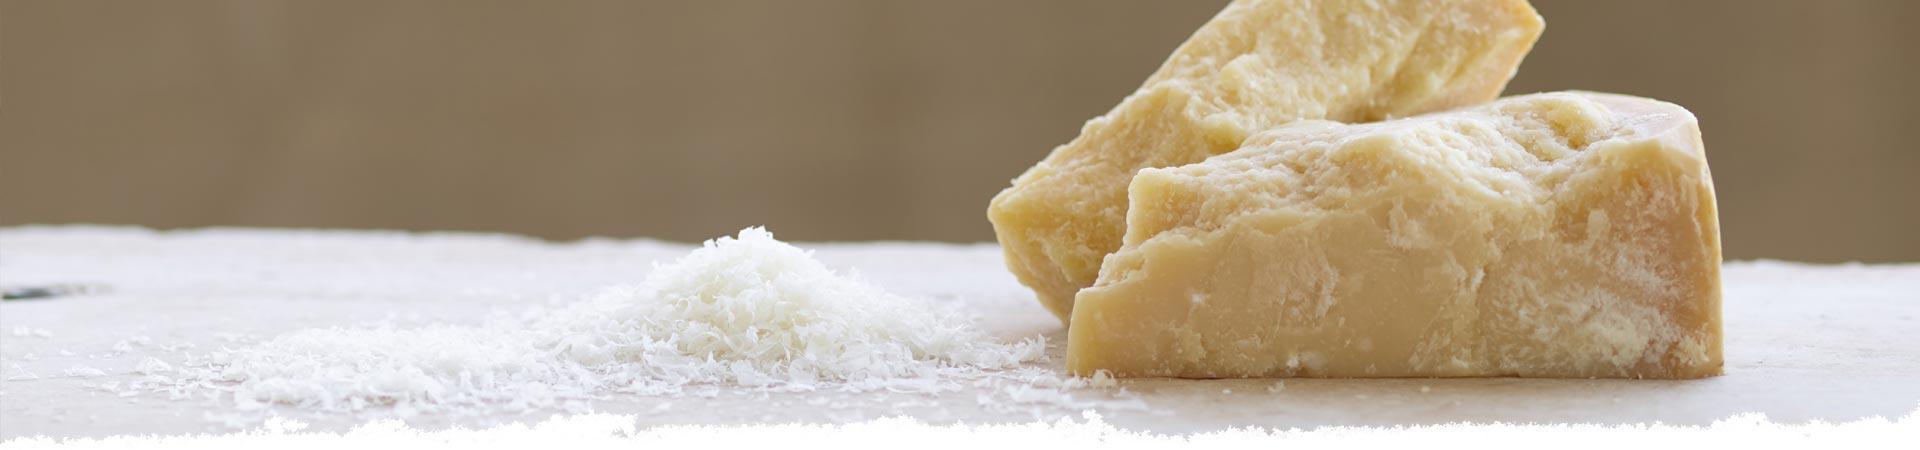 Grating Parmigiano Reggiano